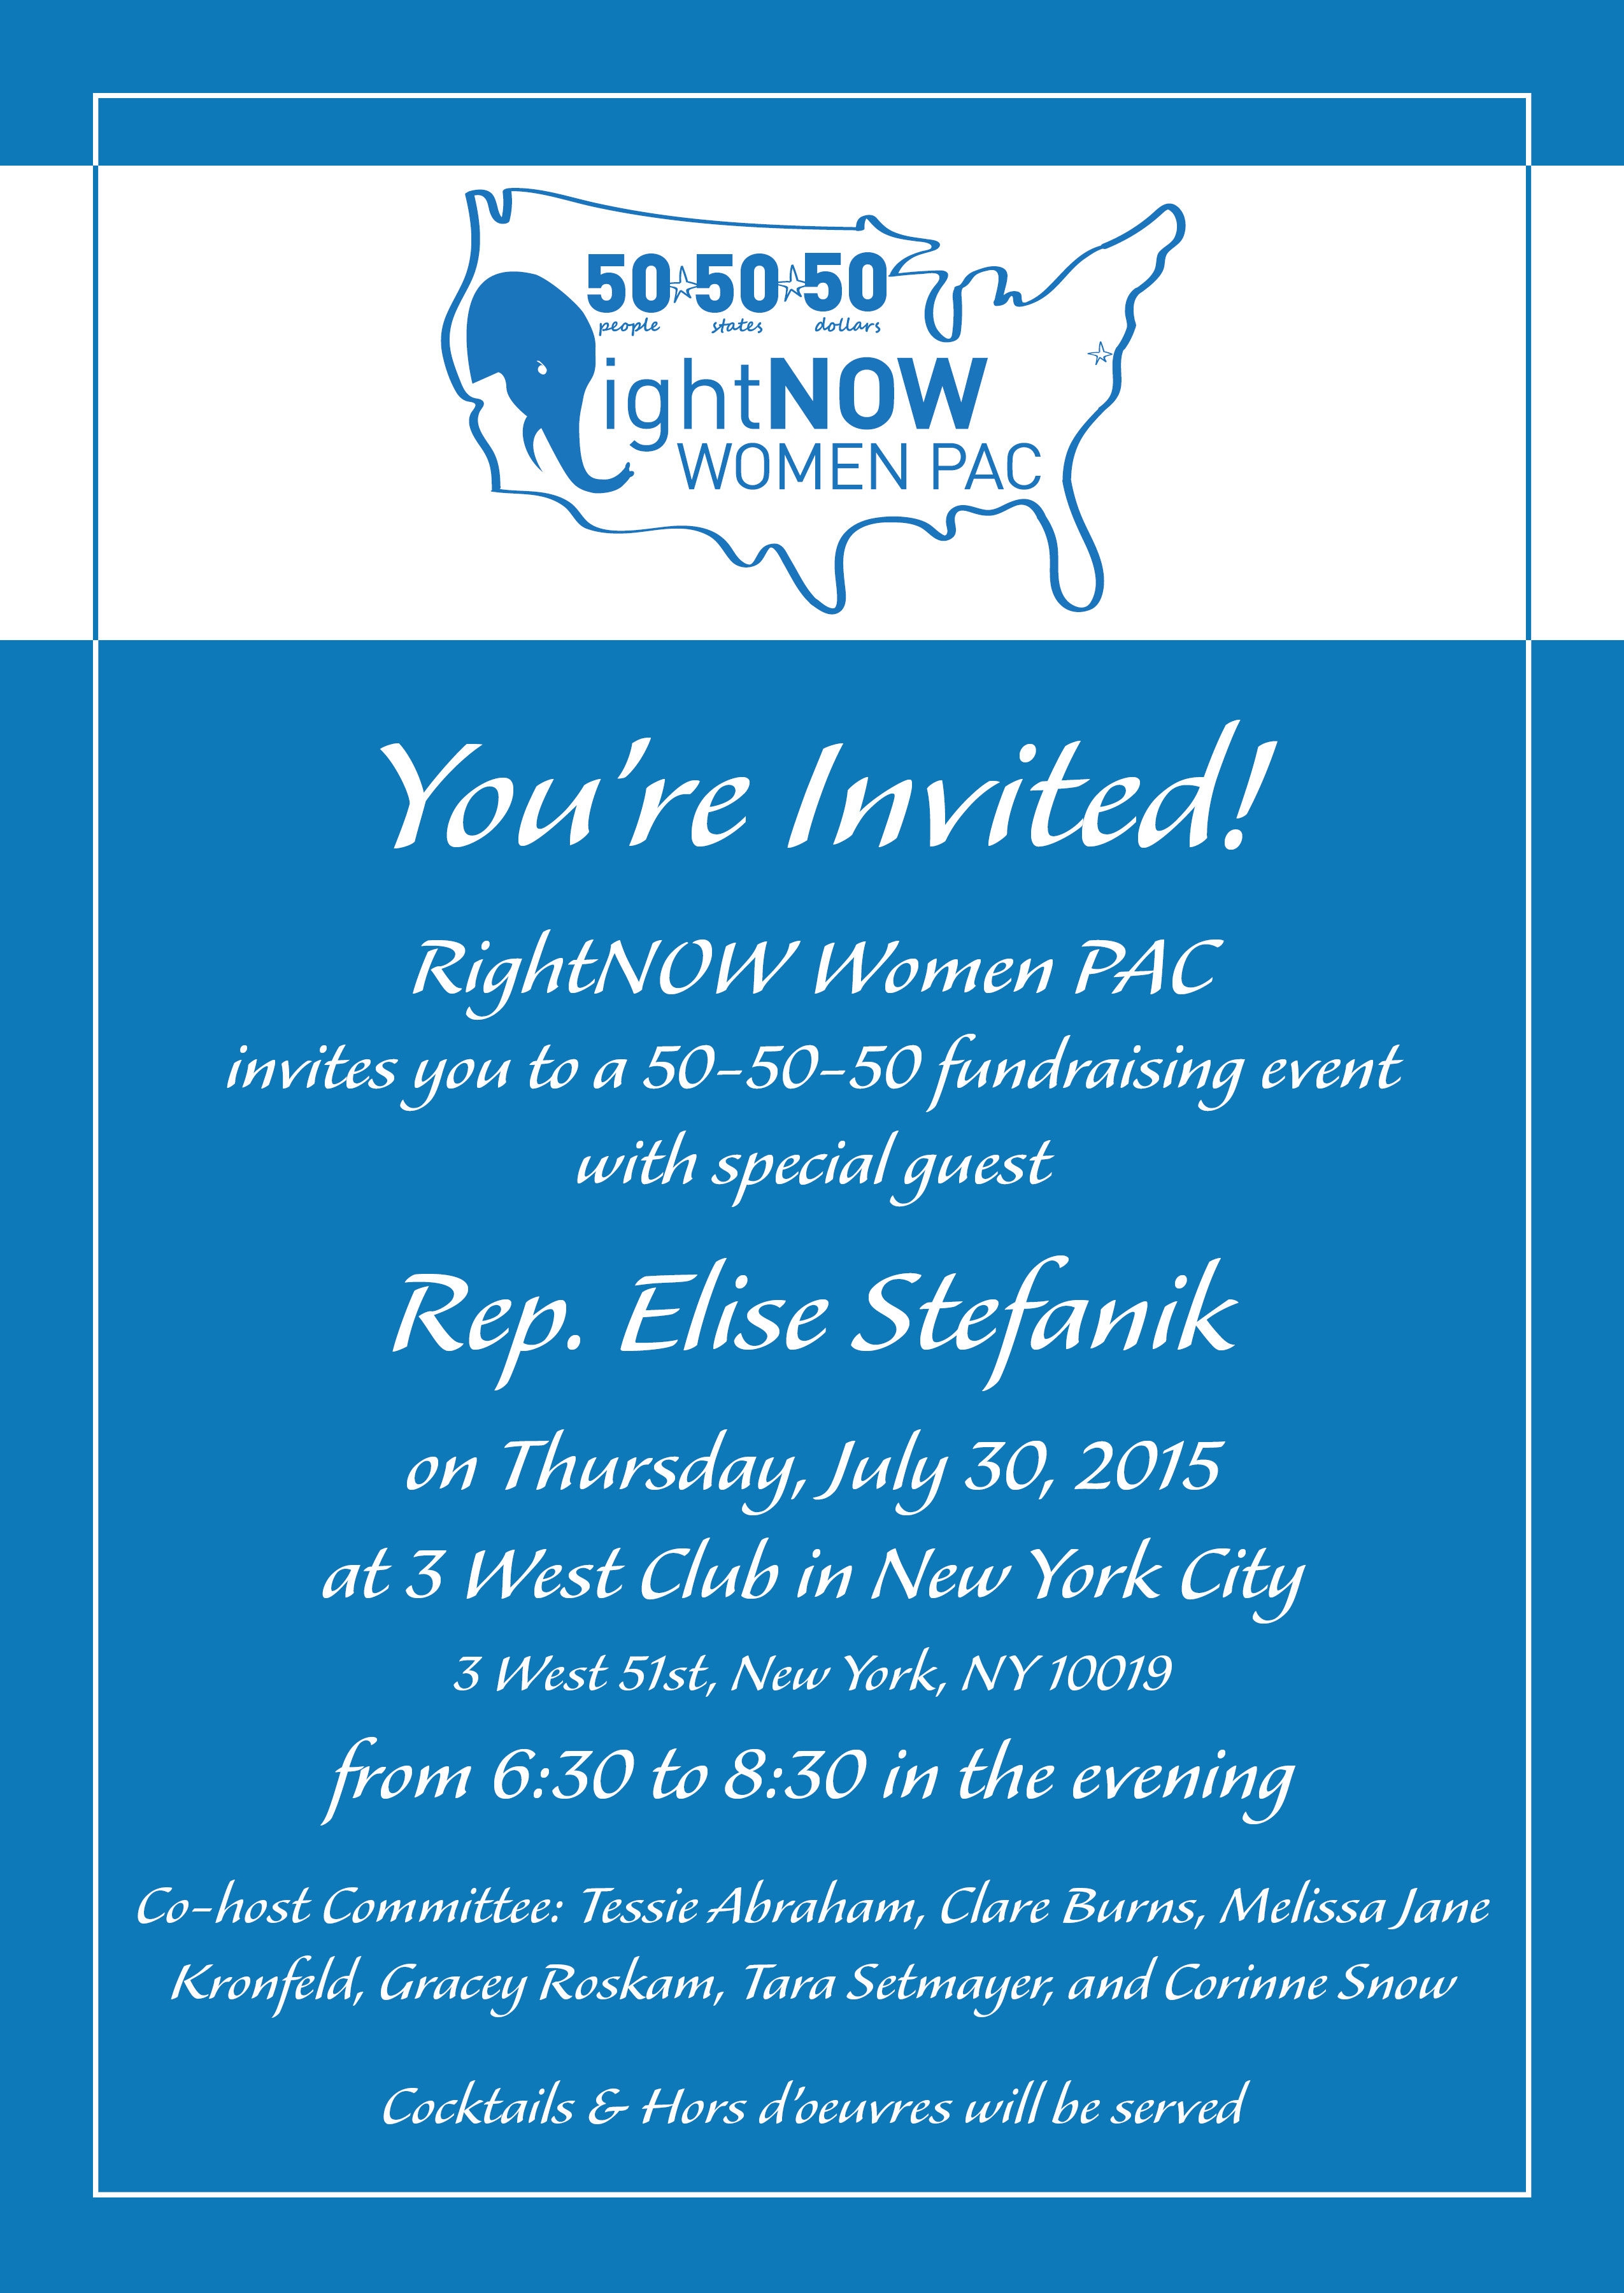 NYC_Event_Invite.jpg